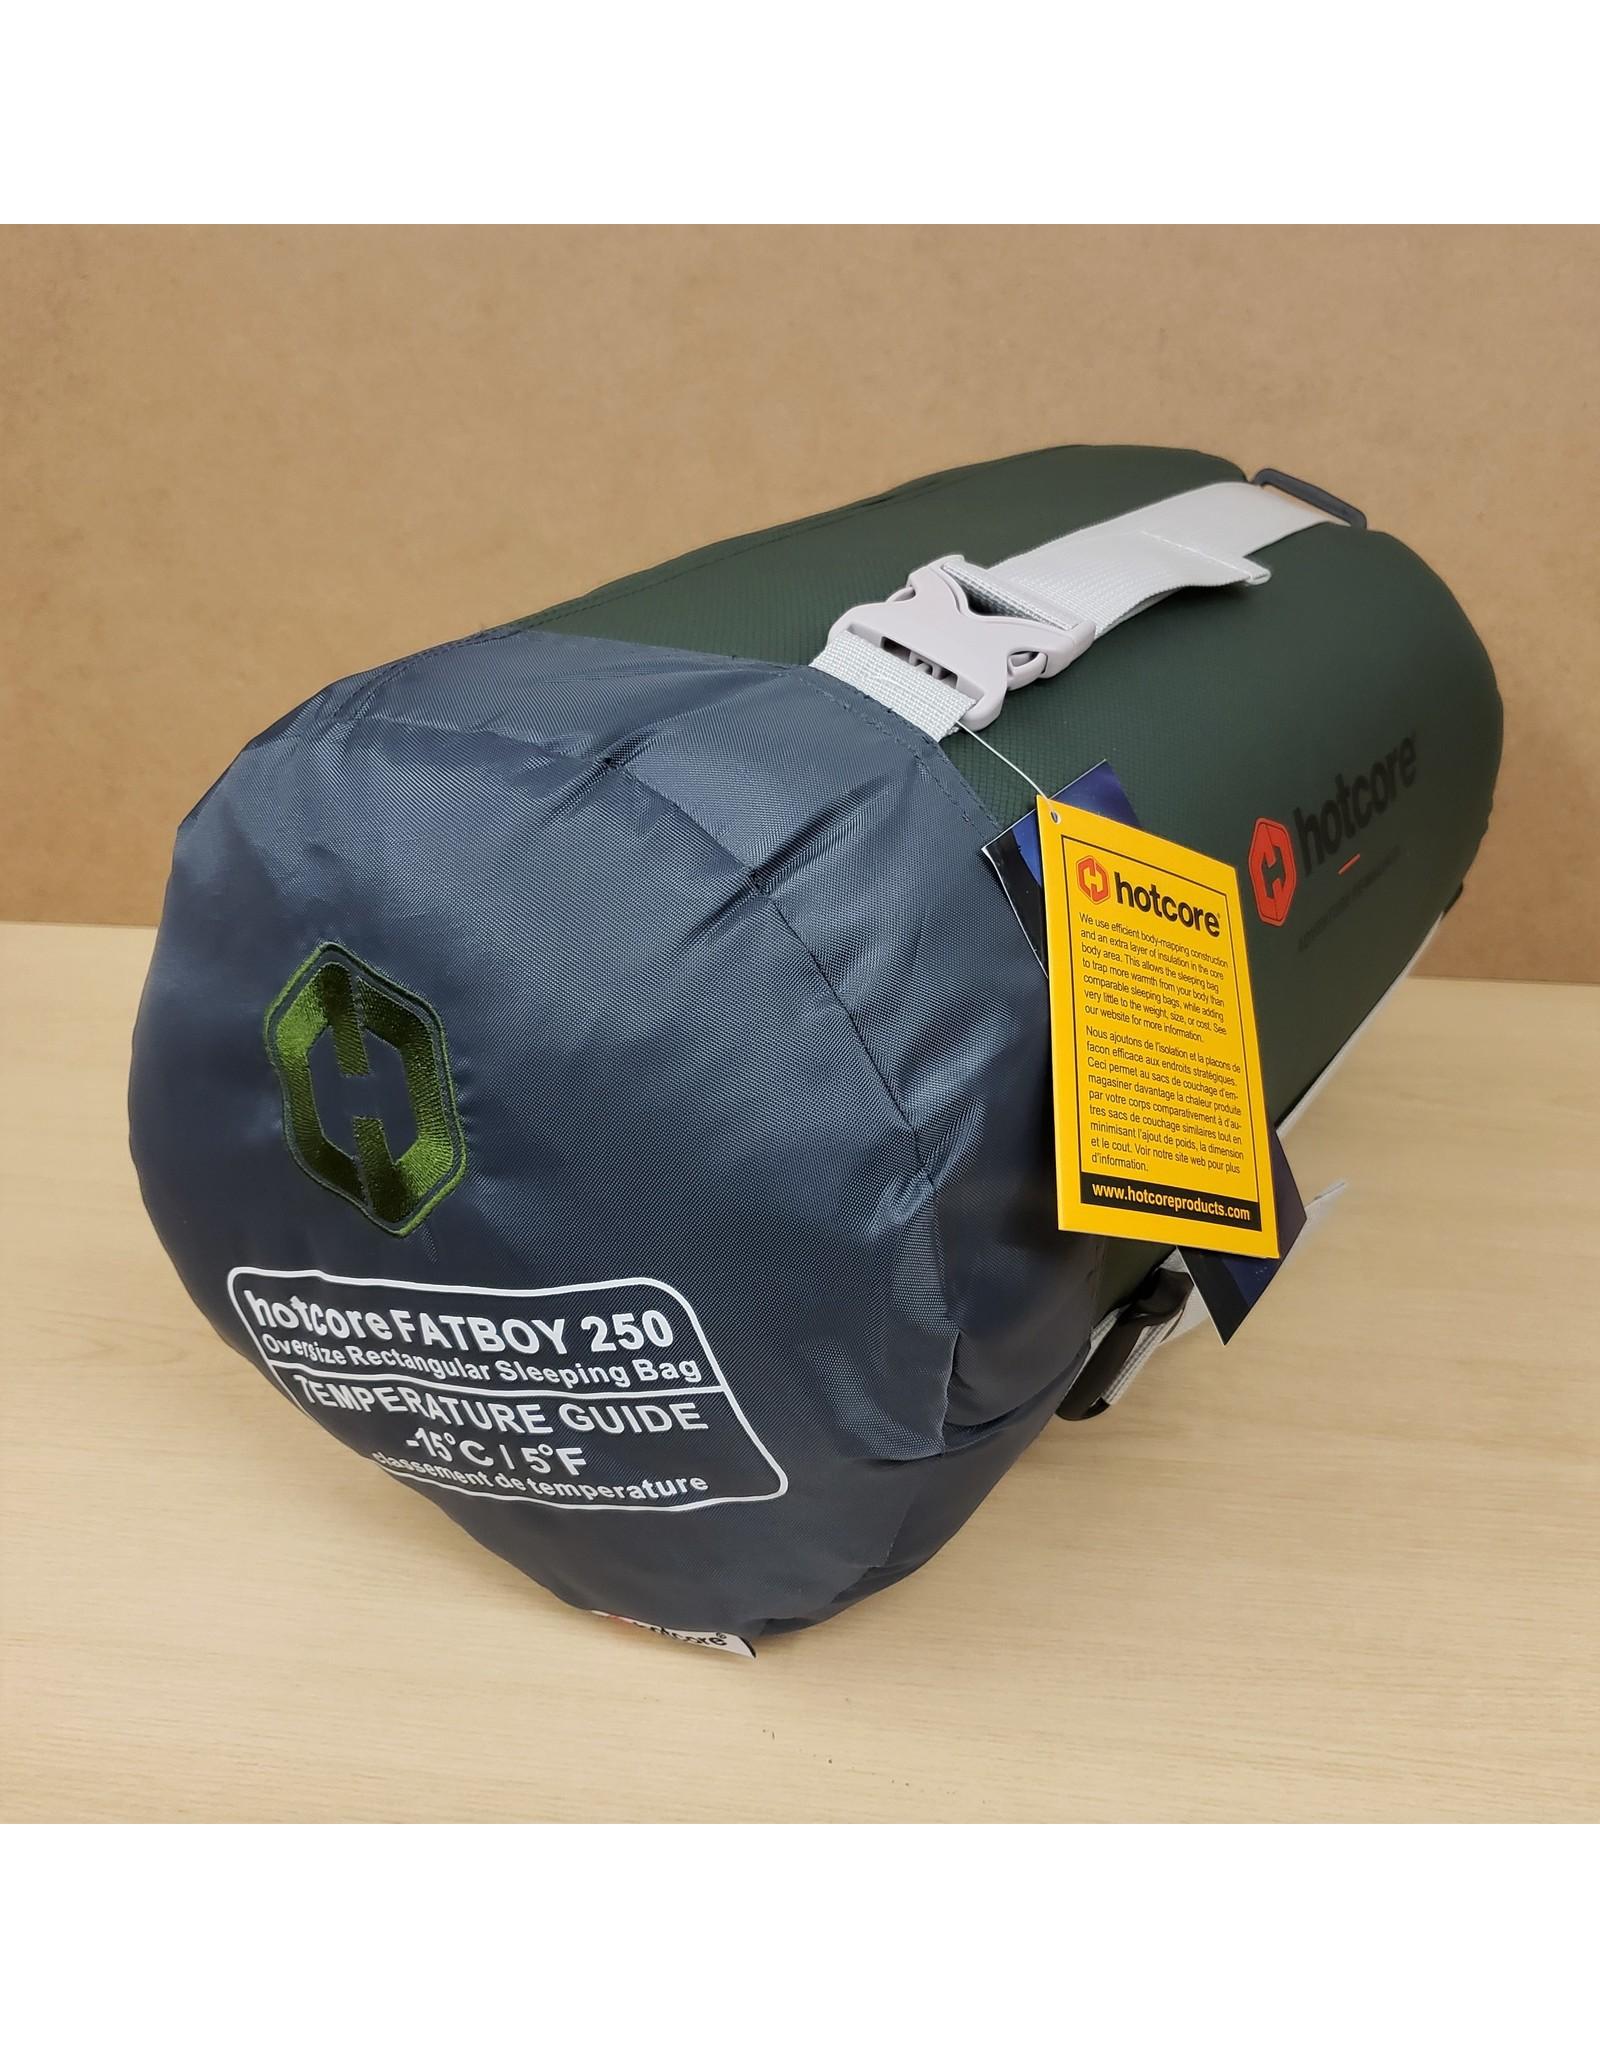 HOTCORE HOTCORE FATBOY 250 SLEEP BAG Comfort: -10°C (14°F) Limit: -15°C (5°F)